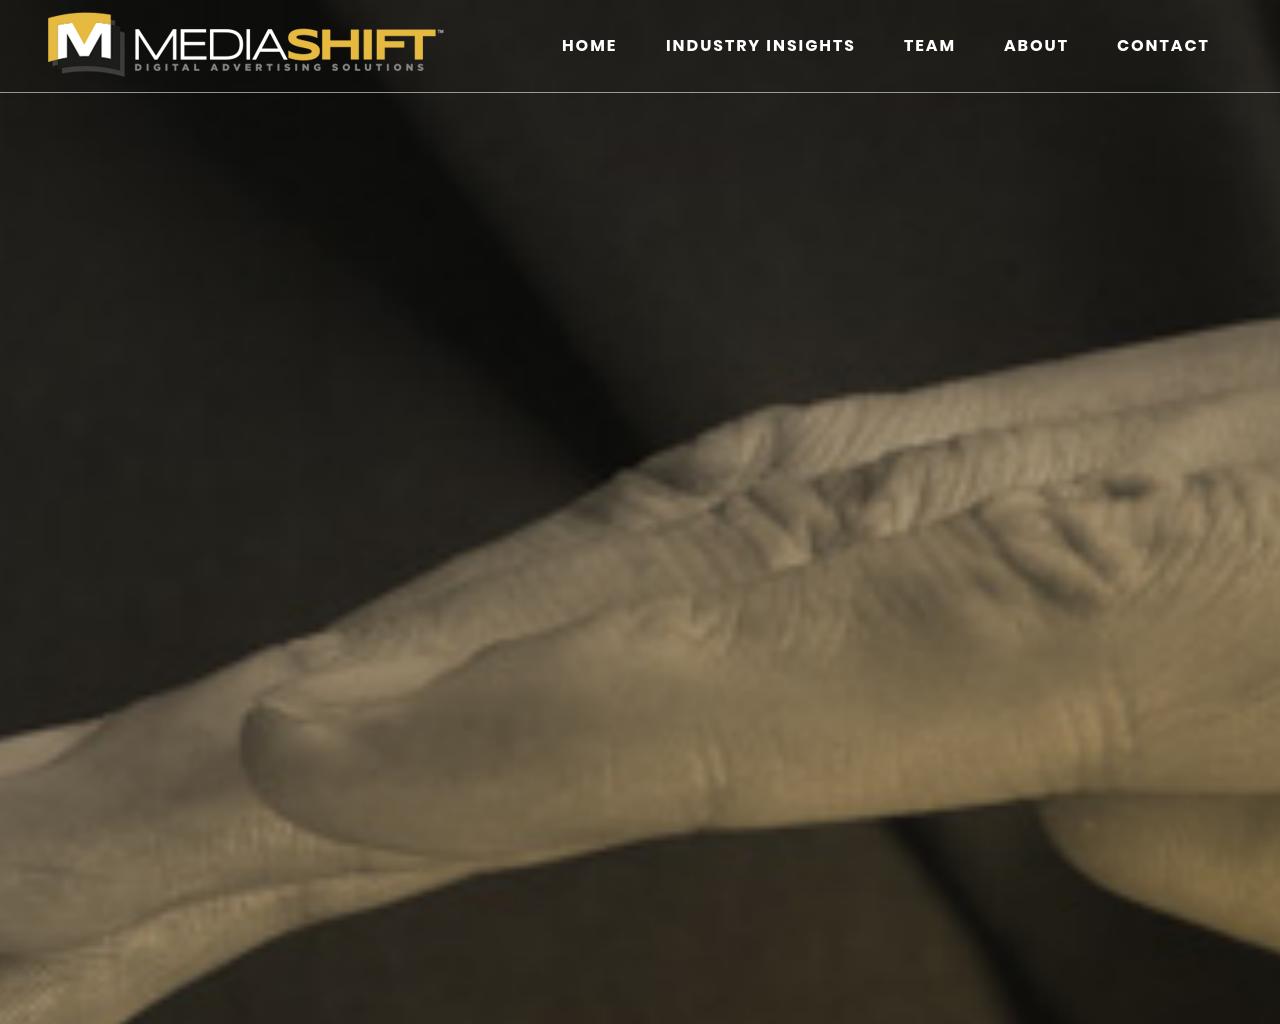 Mediashift-Advertising-Reviews-Pricing